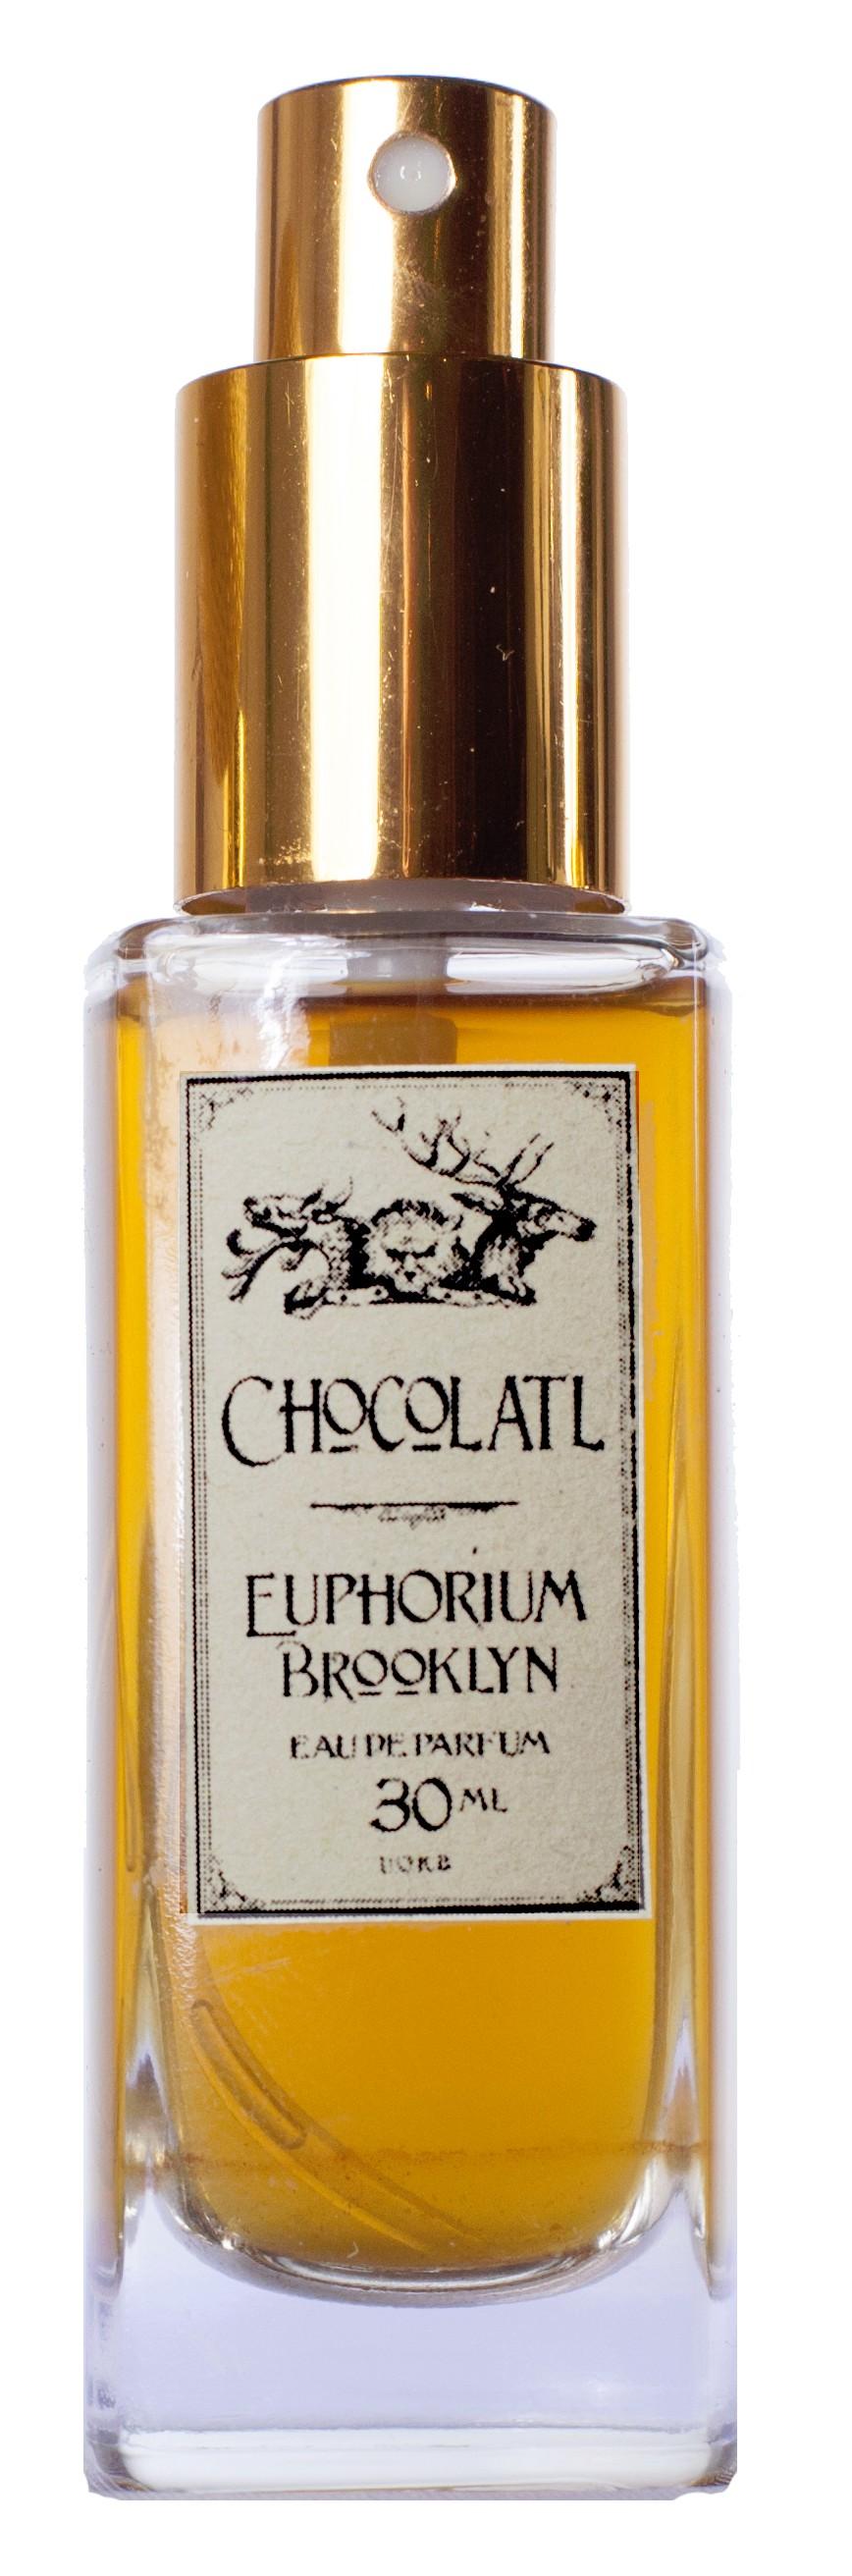 Euphorium Brooklyn Chocolatl аромат для мужчин и женщин